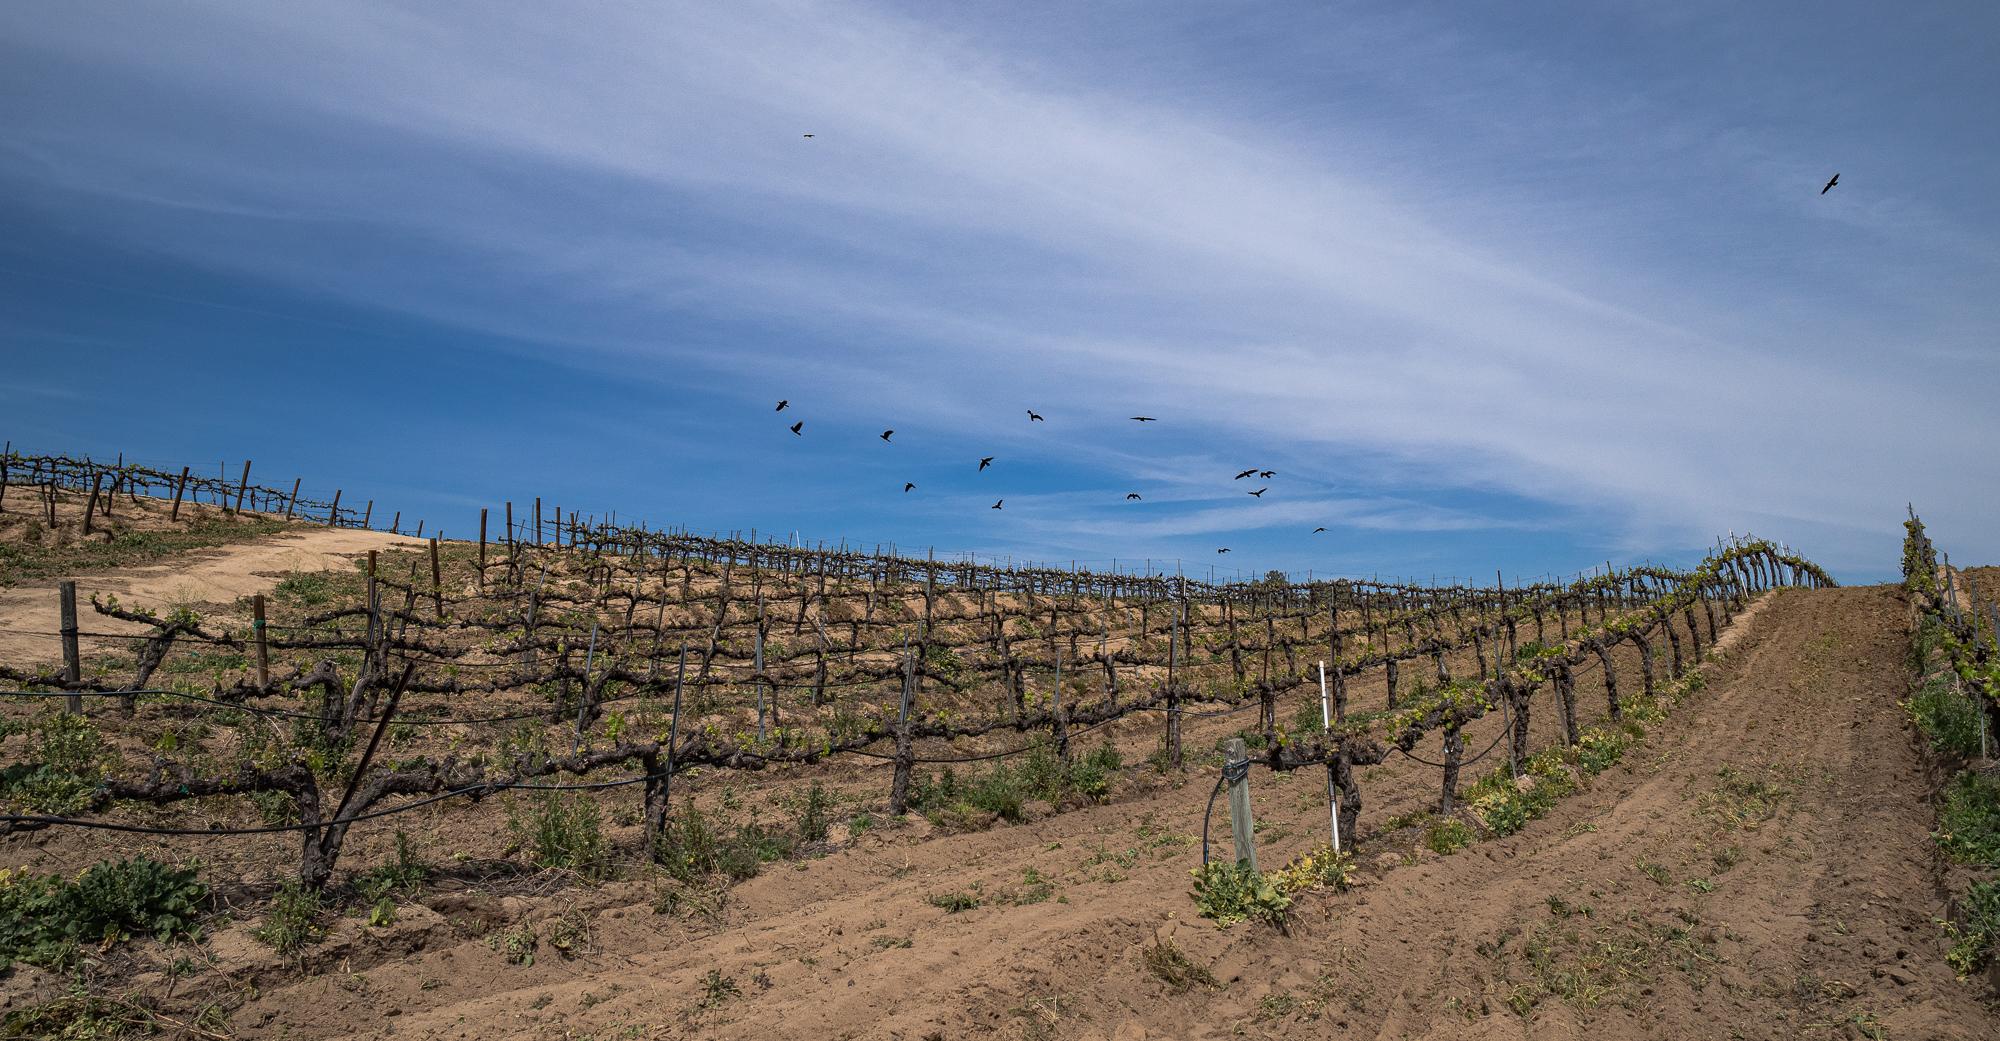 Ravens & Crows Above a Temecula Vineyard